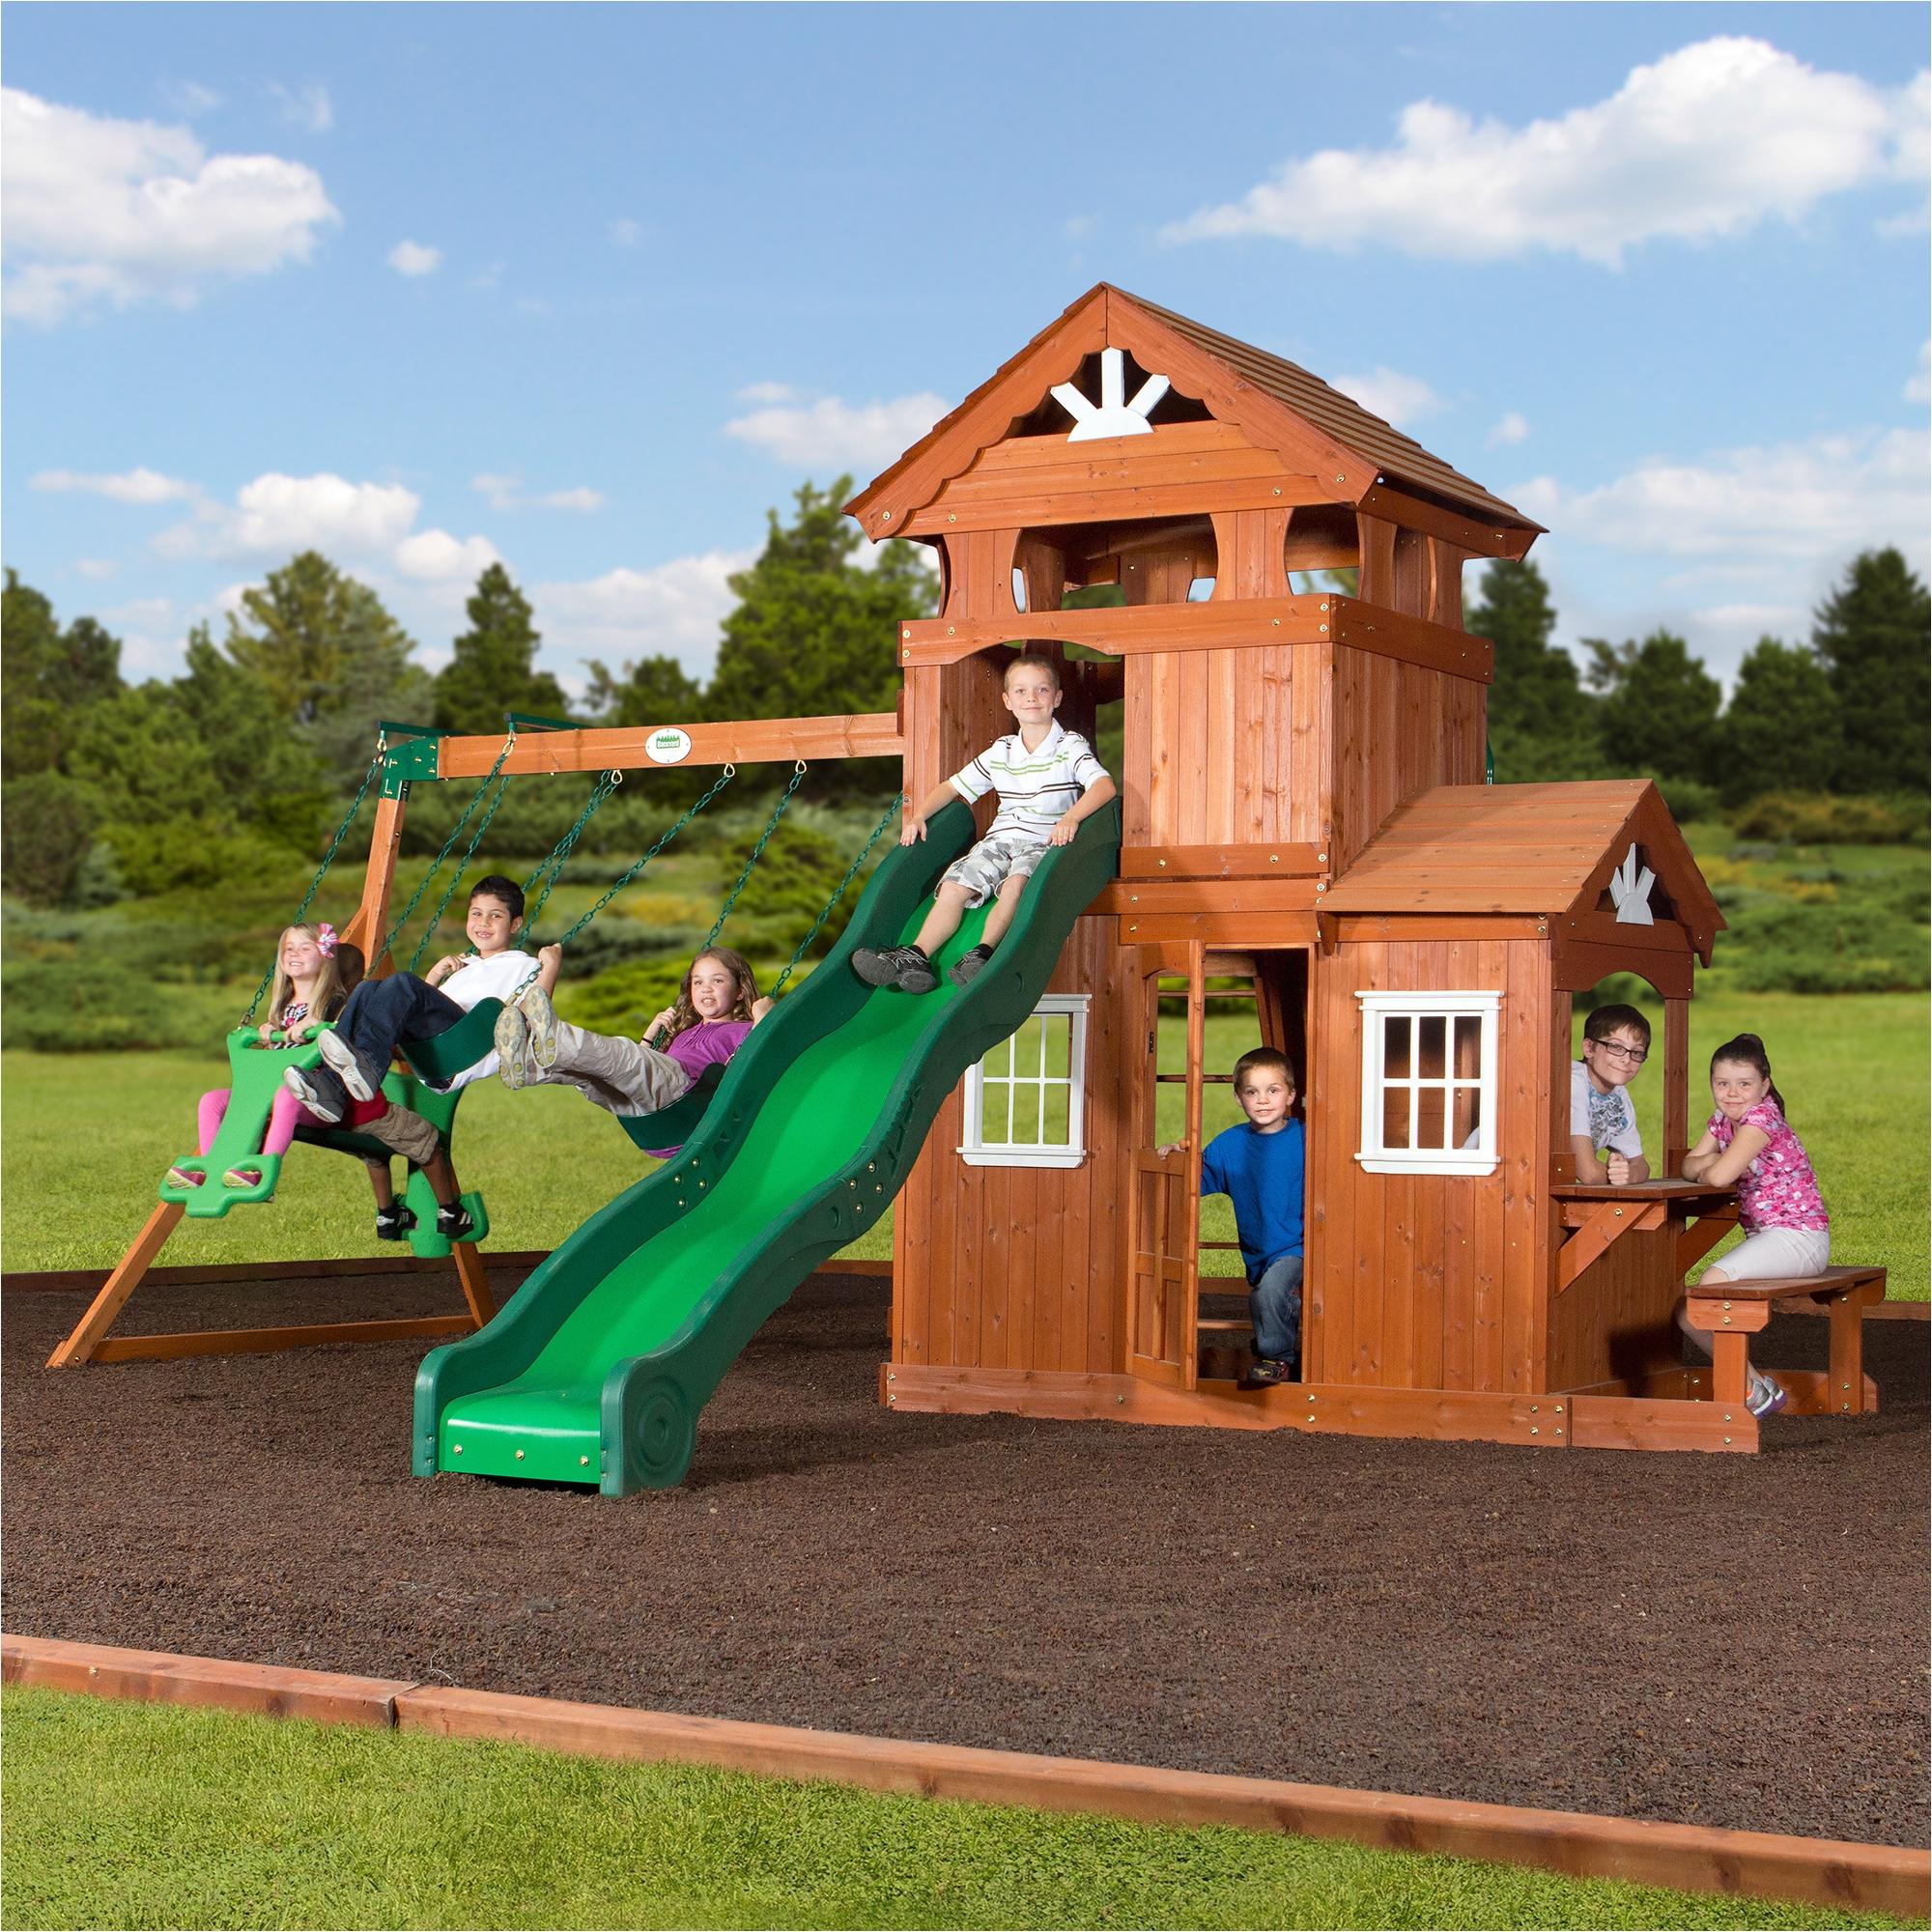 Backyard Discovery Shenandoah Backyard Discovery Shenandoah Cedar Wood Swing Set Walmart Com